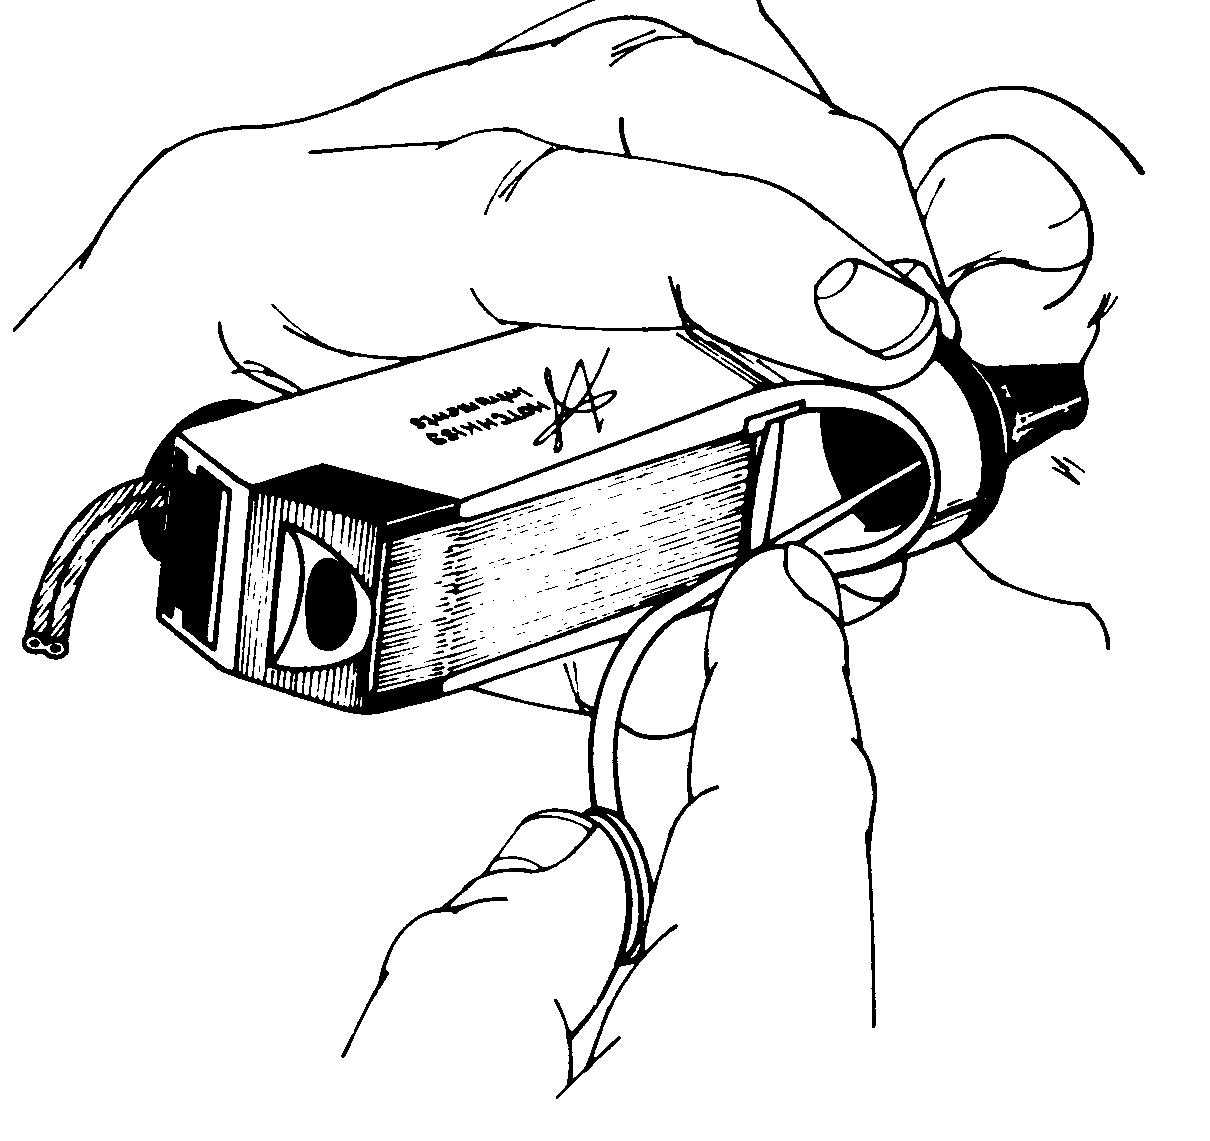 The Hotchkiss Otoscope Instruction & Operation Manual